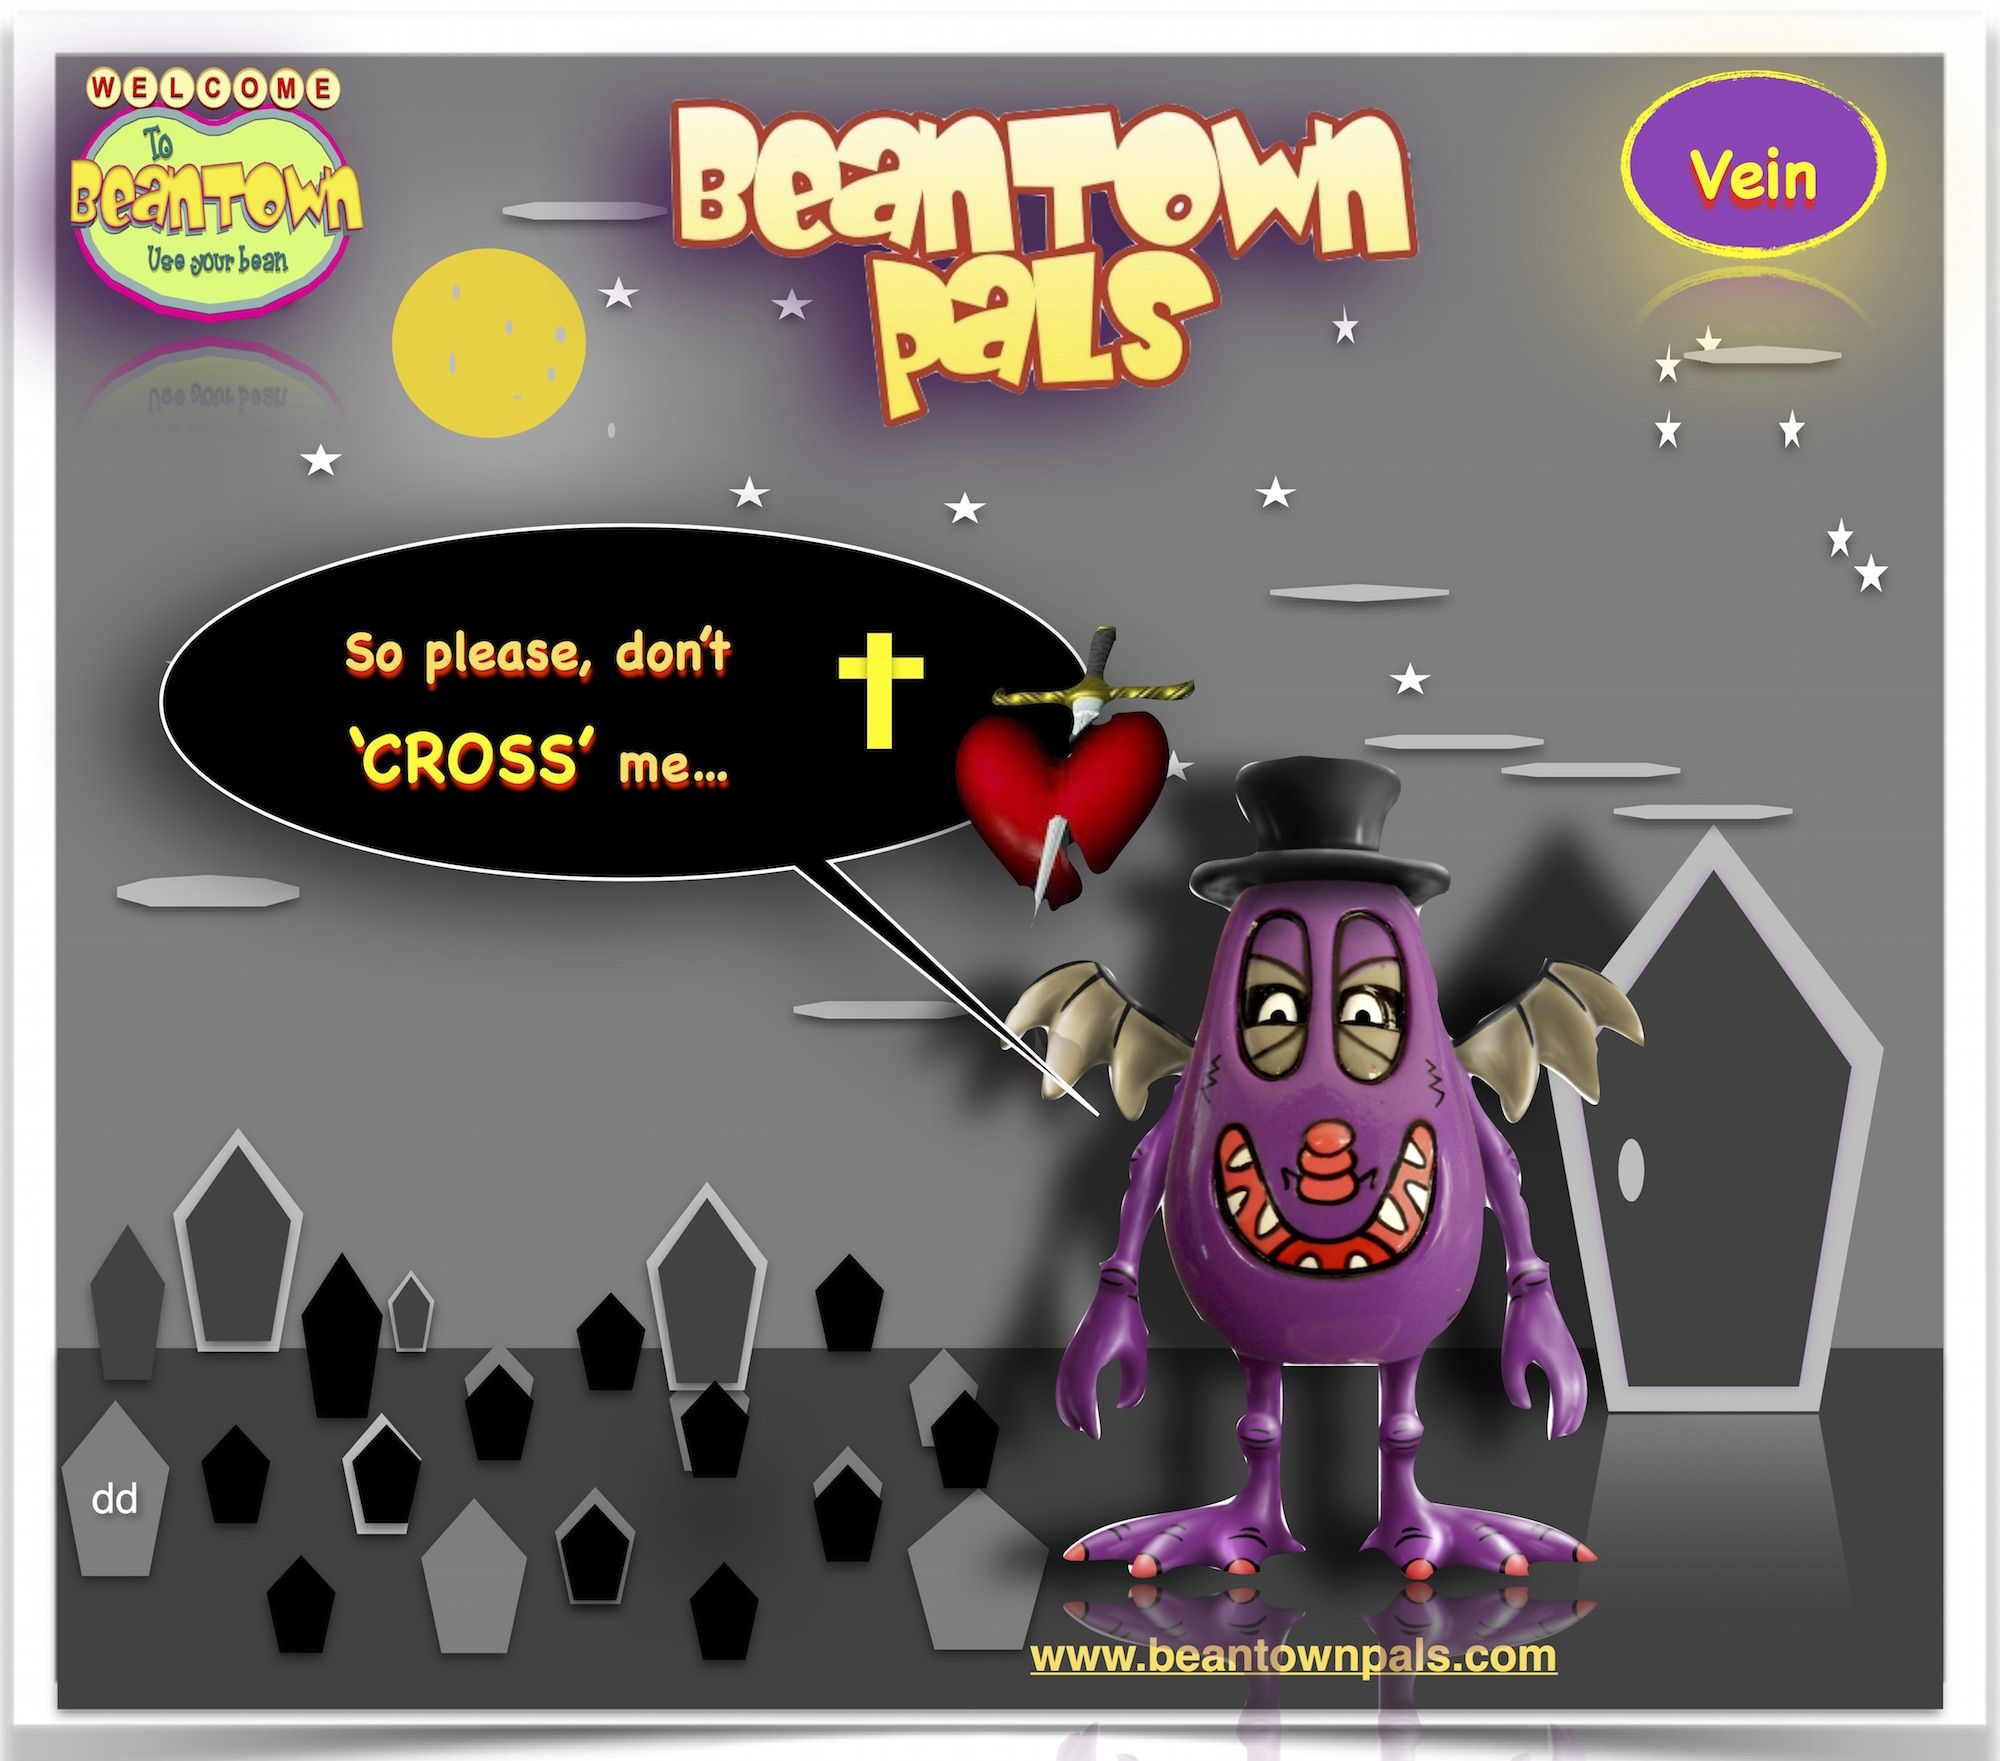 vein #bean #please #don't #cross #me #vampire #beantownpals #disney